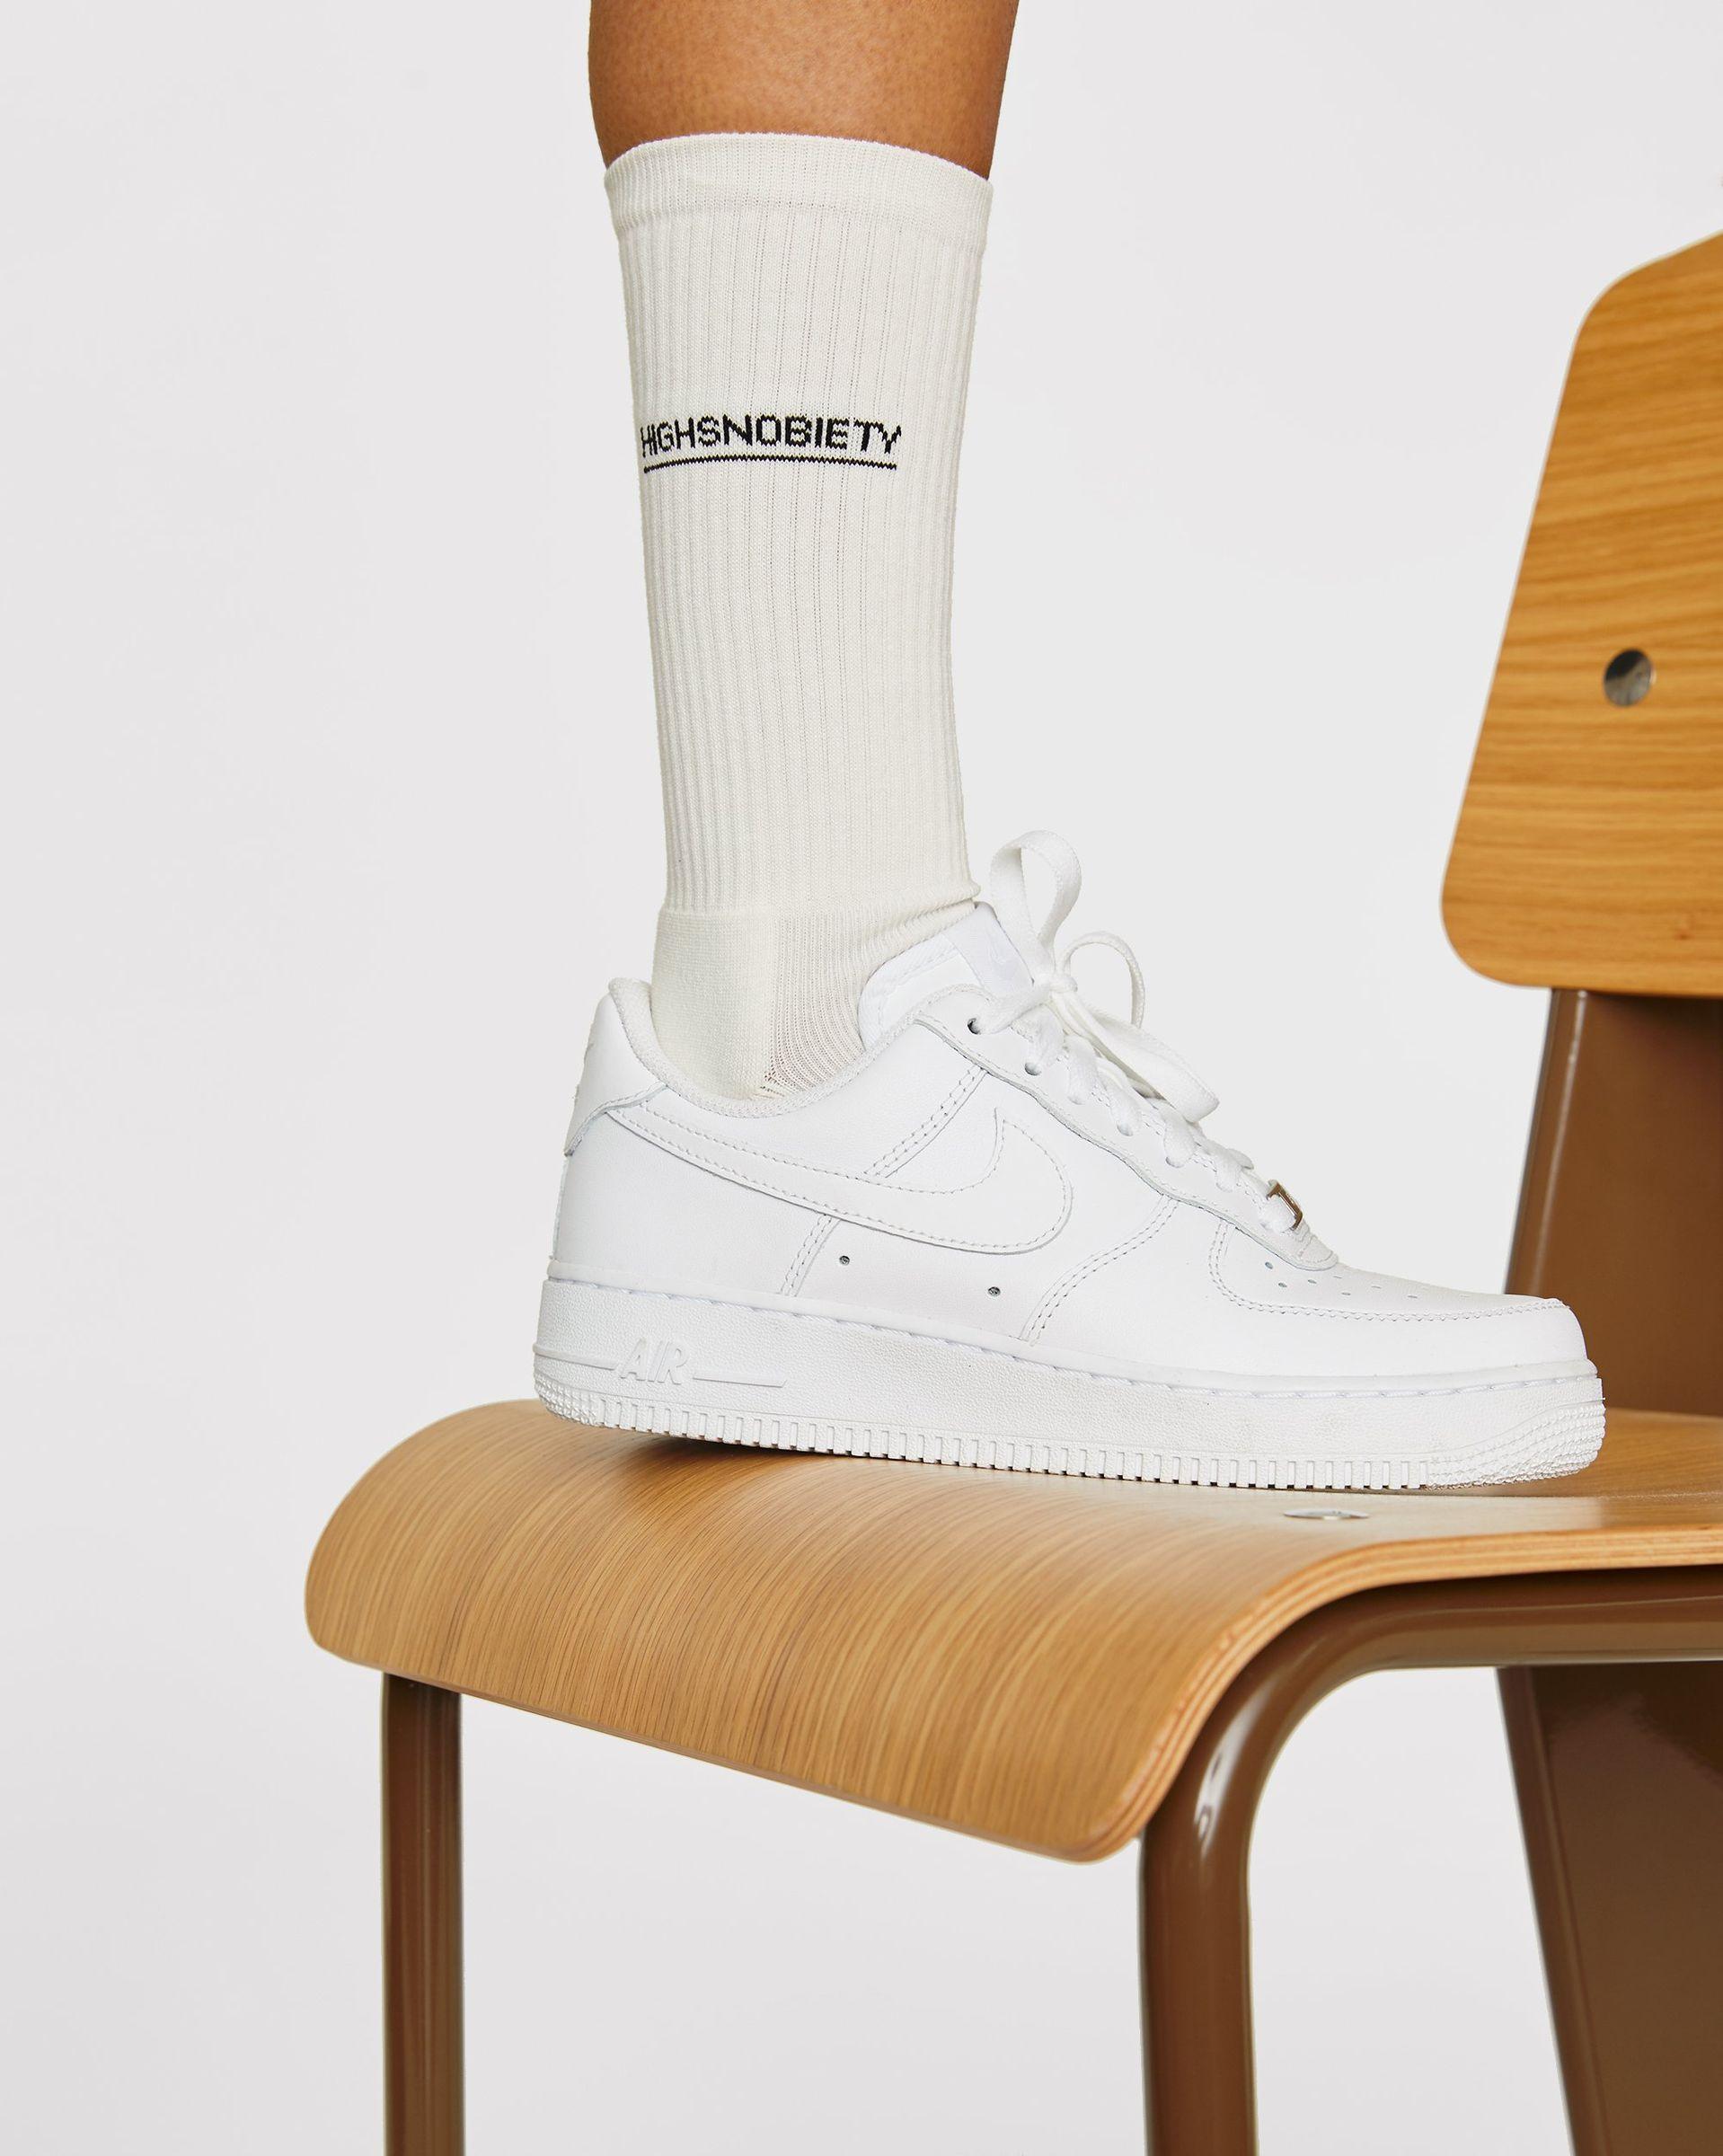 Highsnobiety Staples - Socks White - Image 2